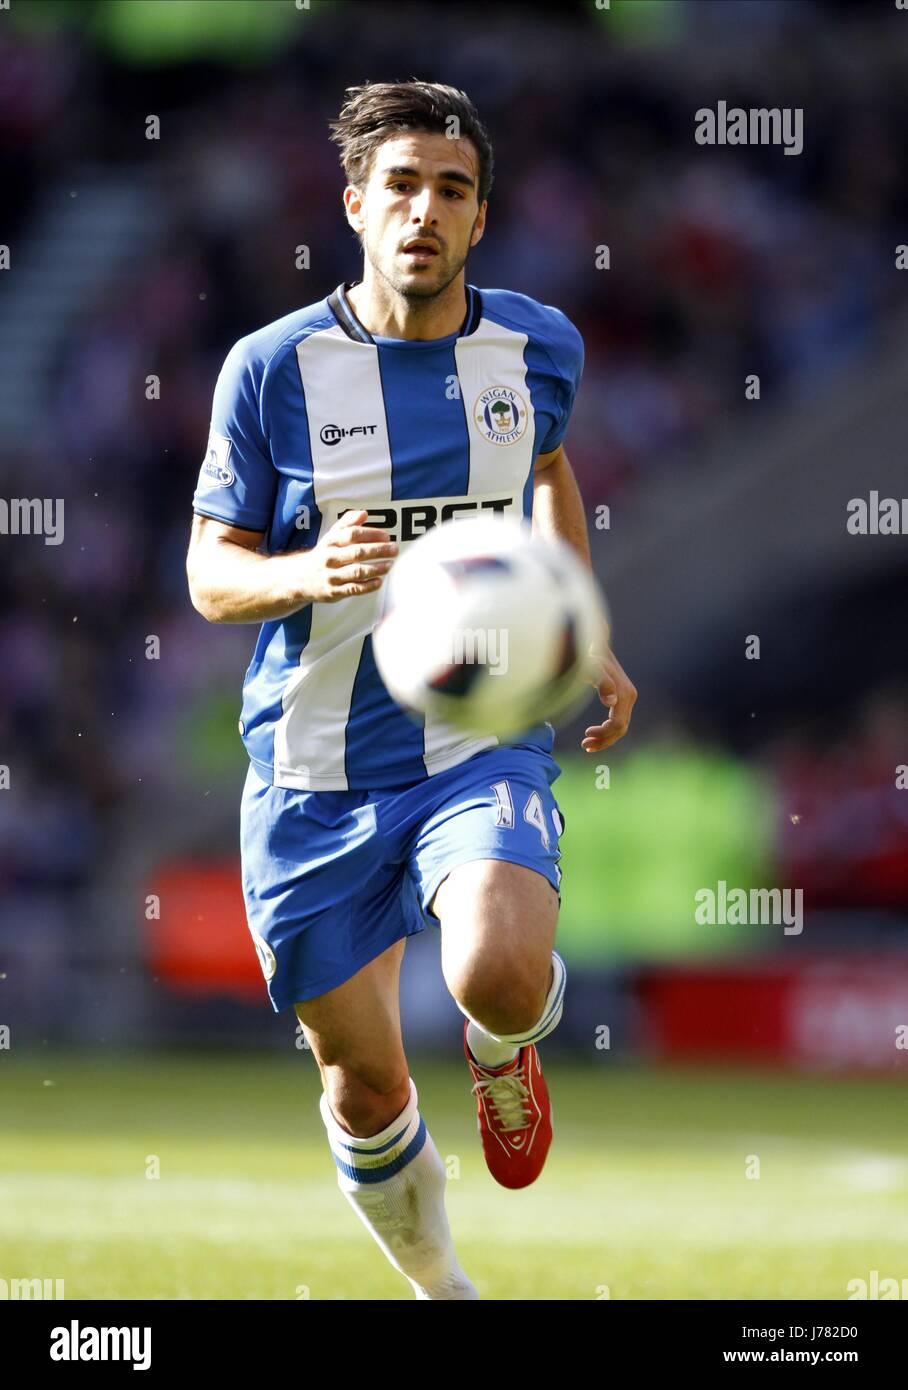 JORDI GOMEZ WIGAN ATHLETIC FC STADIUM OF LIGHT SUNDERLAND ENGLAND 29 September 2012 - Stock Image